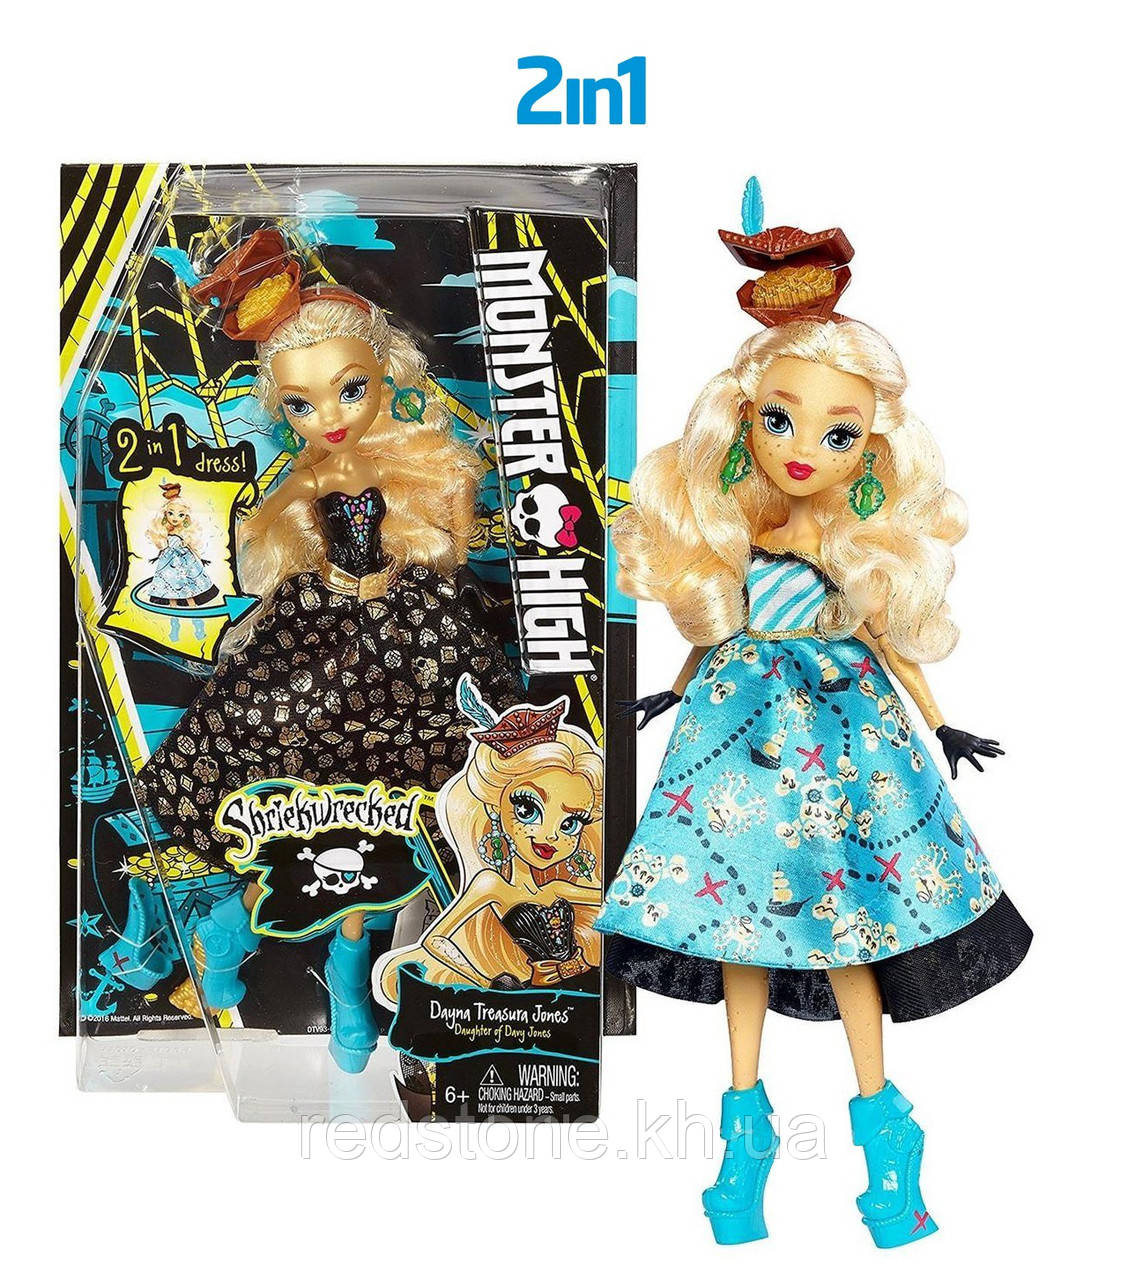 Кукла Монстер Хай Дана Трежура Джонс Monster High Shriekwrecked Dayna Treasura Jones Doll 2in1 dress ОРИГИНАЛ